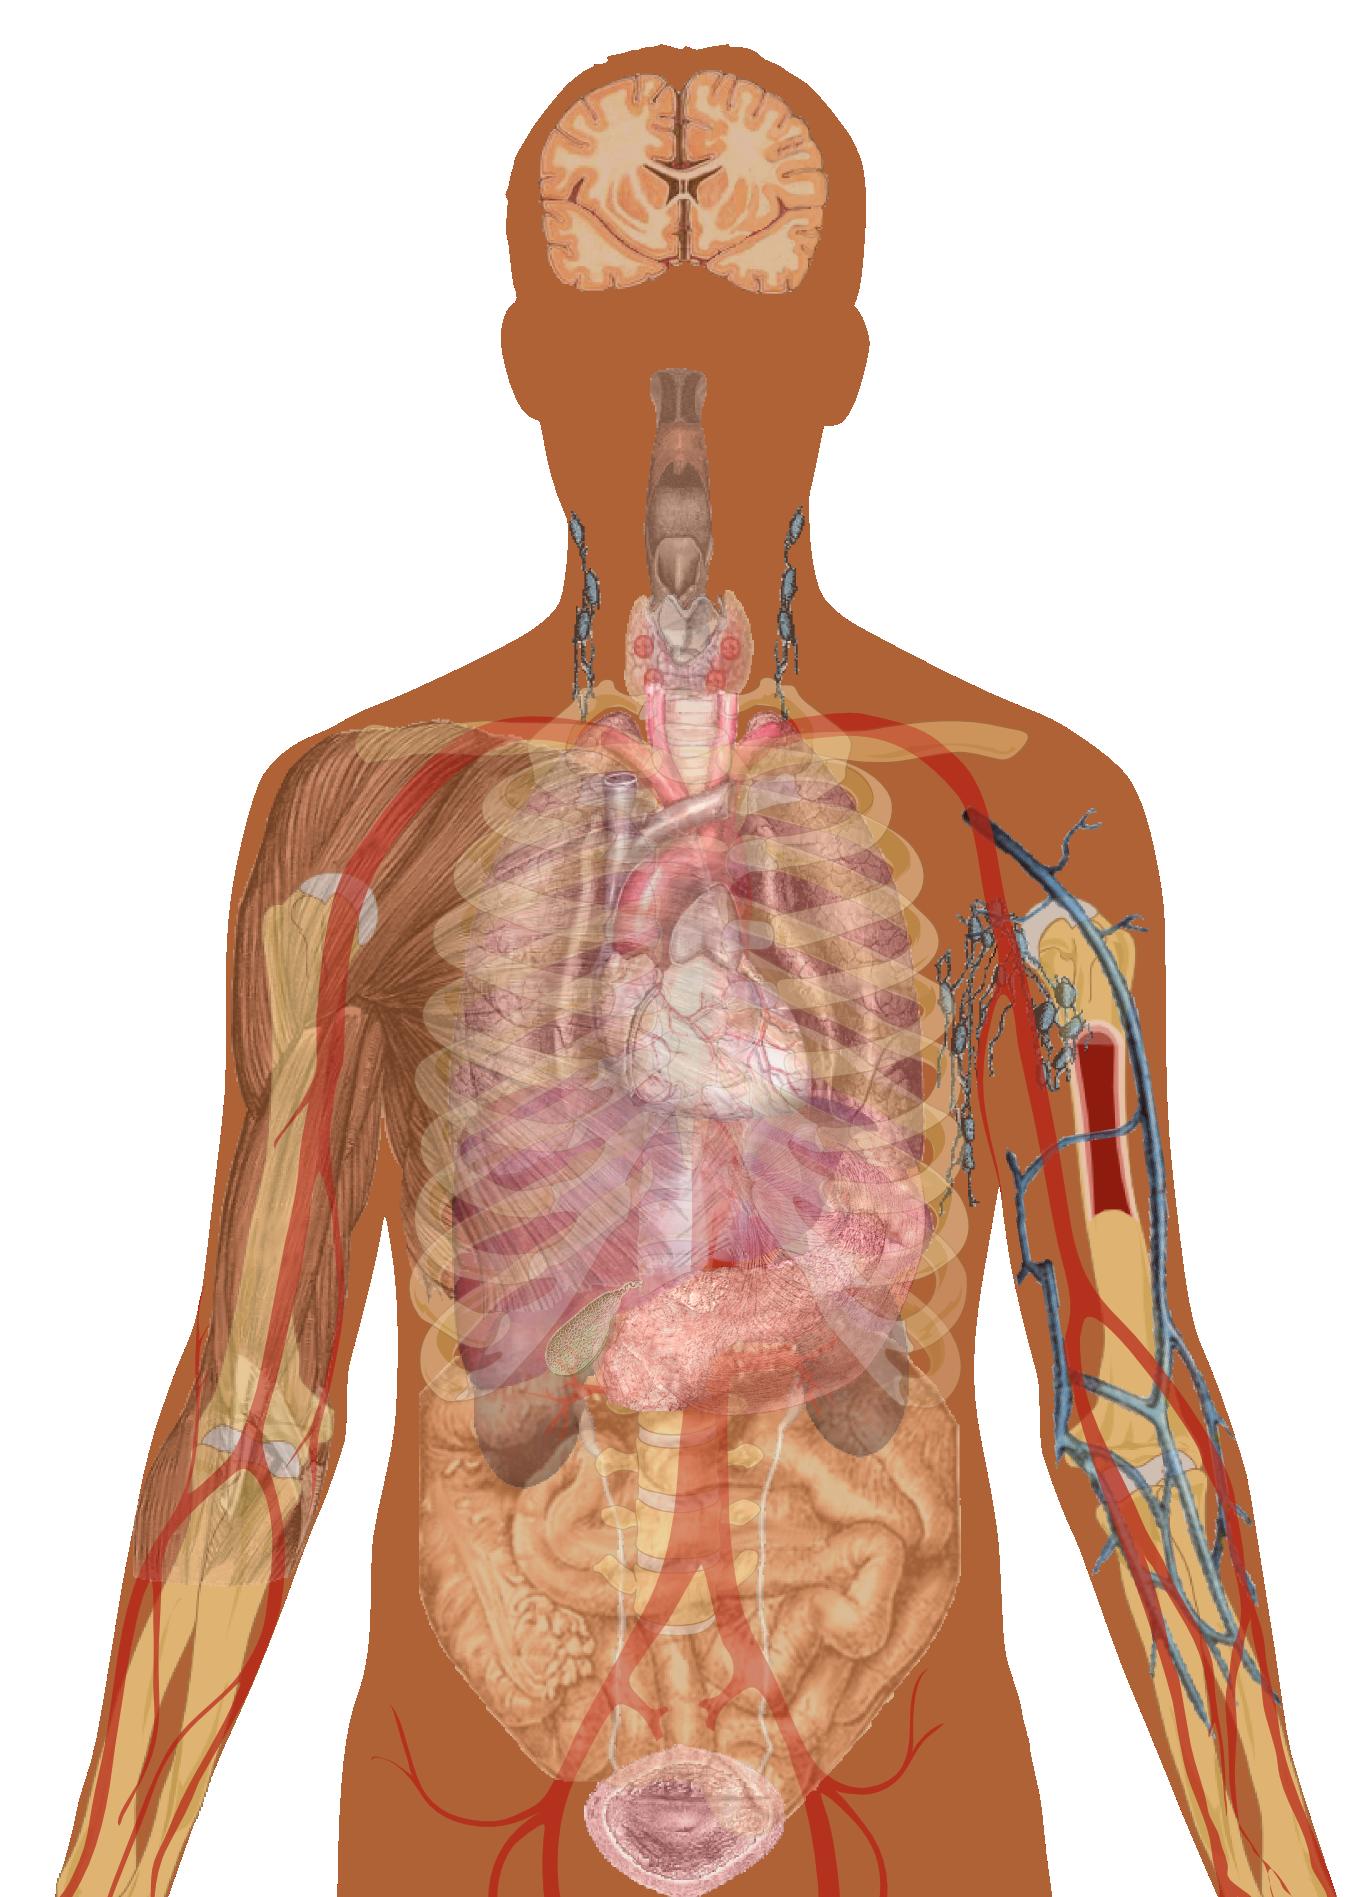 Man shadow with organs | BI ~ Human Anatomy | Pinterest | Human anatomy